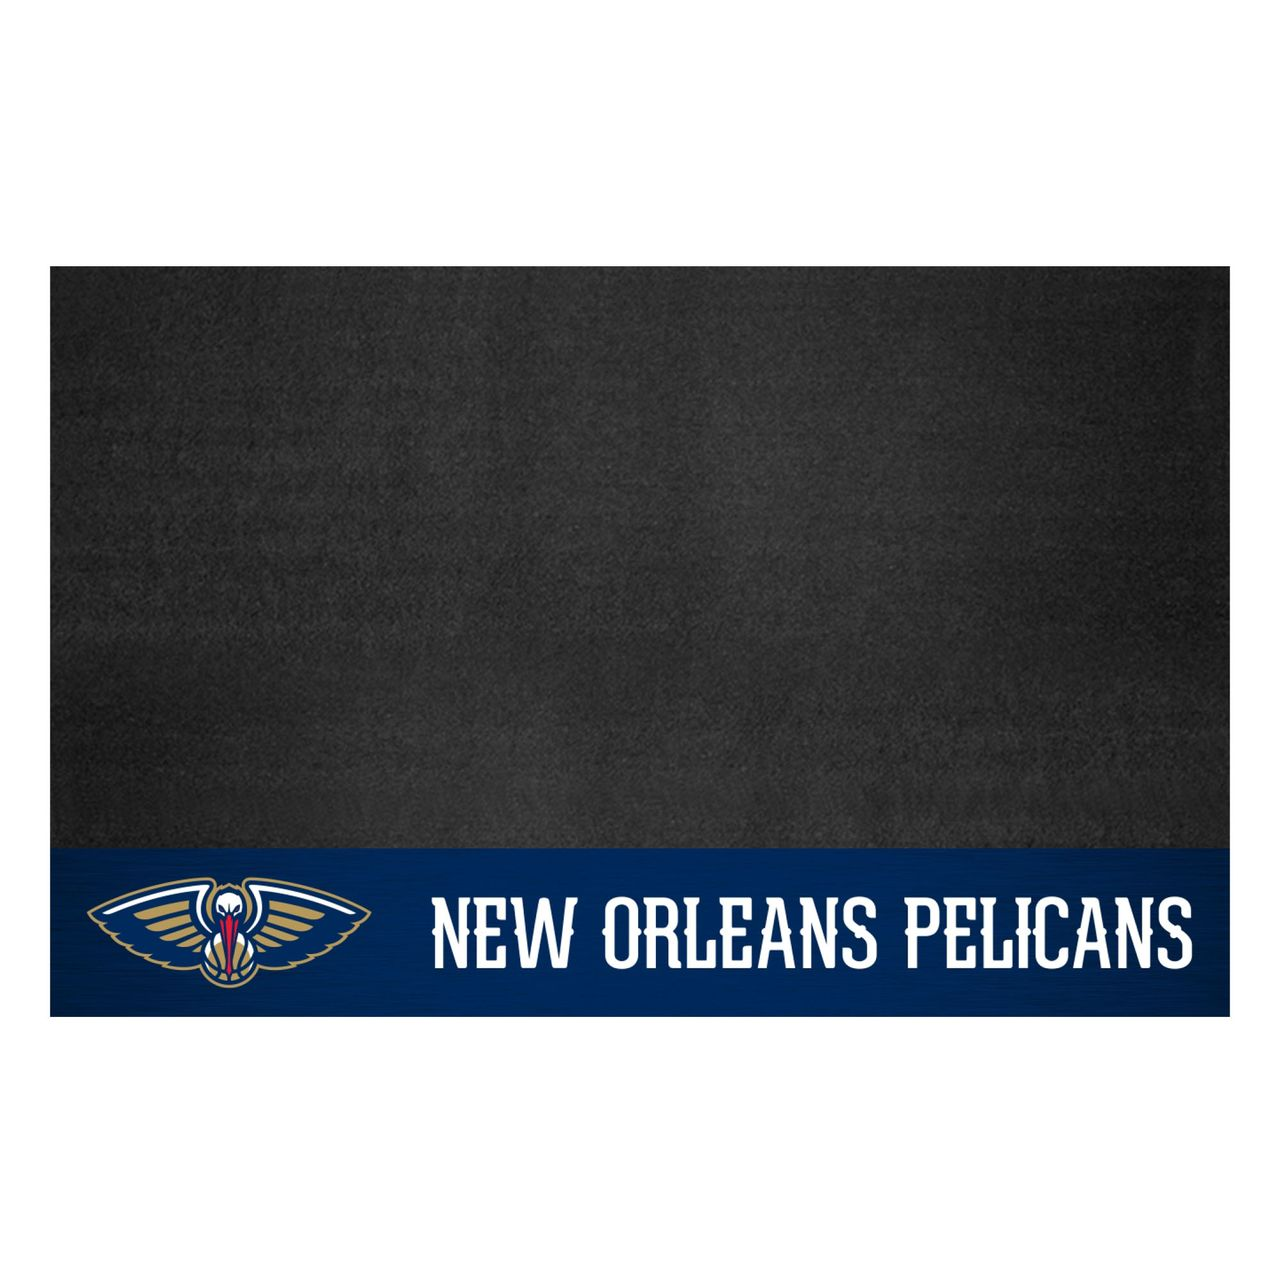 "Fanmats 14213 NBA - New Orleans Pelicans Grill Mat 26""x42"""